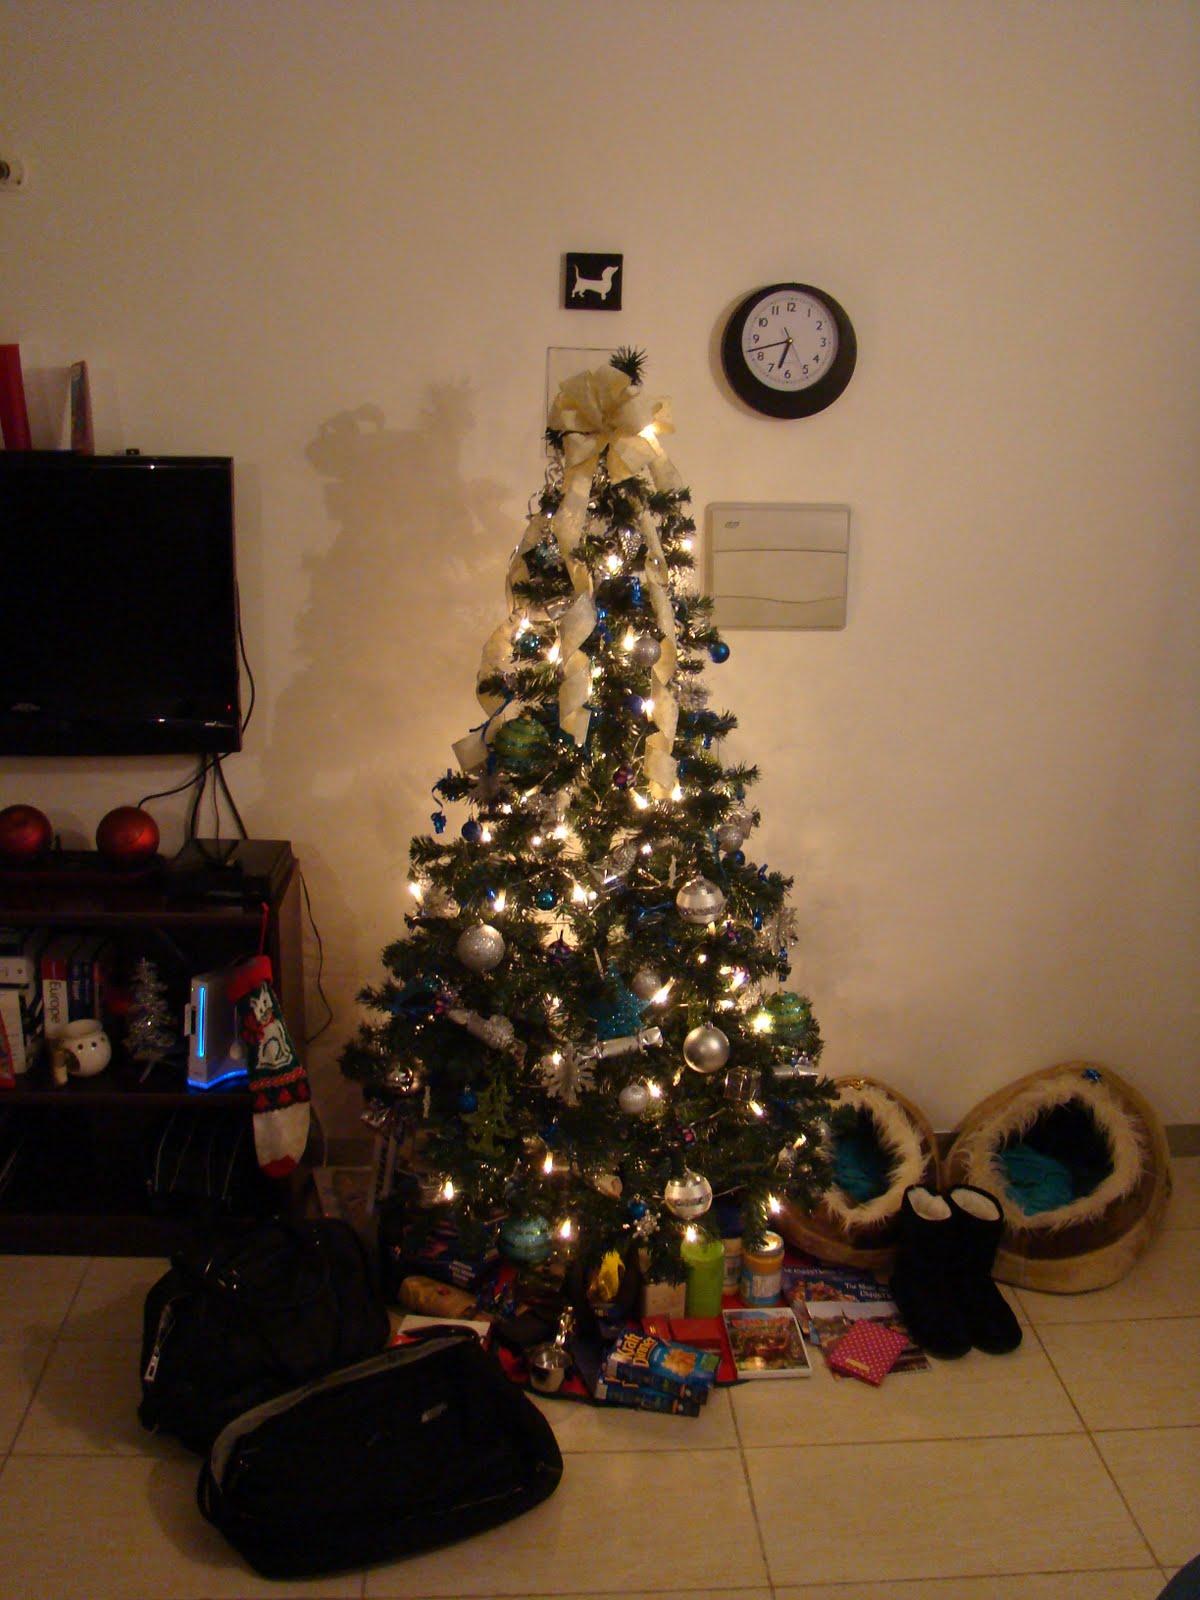 Maltese christmas ornaments - Our Fake Maltese Christmas Tree No Real Trees On This Island